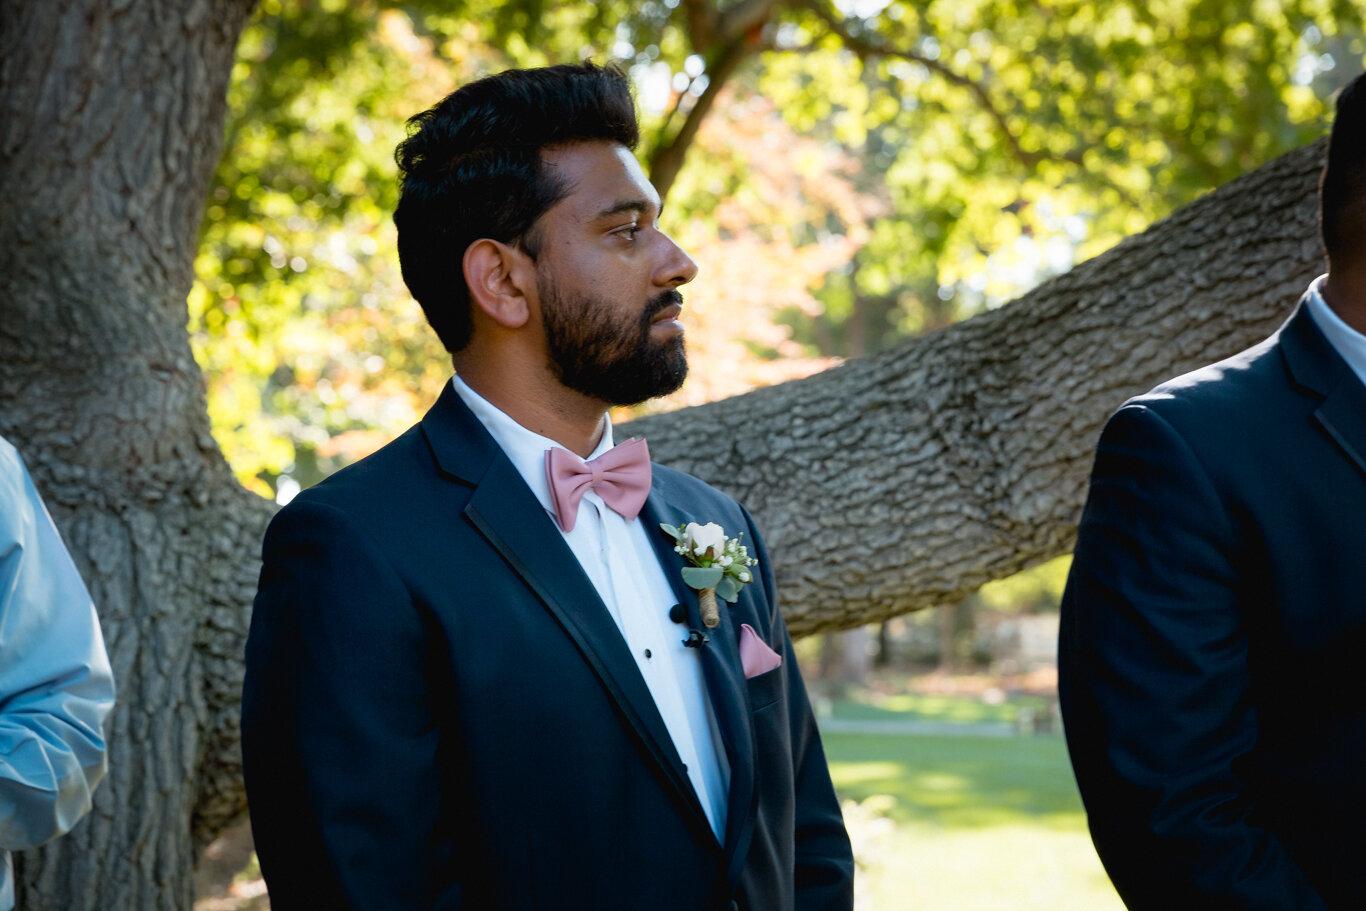 2019.08.24_Emily-Ashir-Wedding-at-the-Maples-5742.jpg